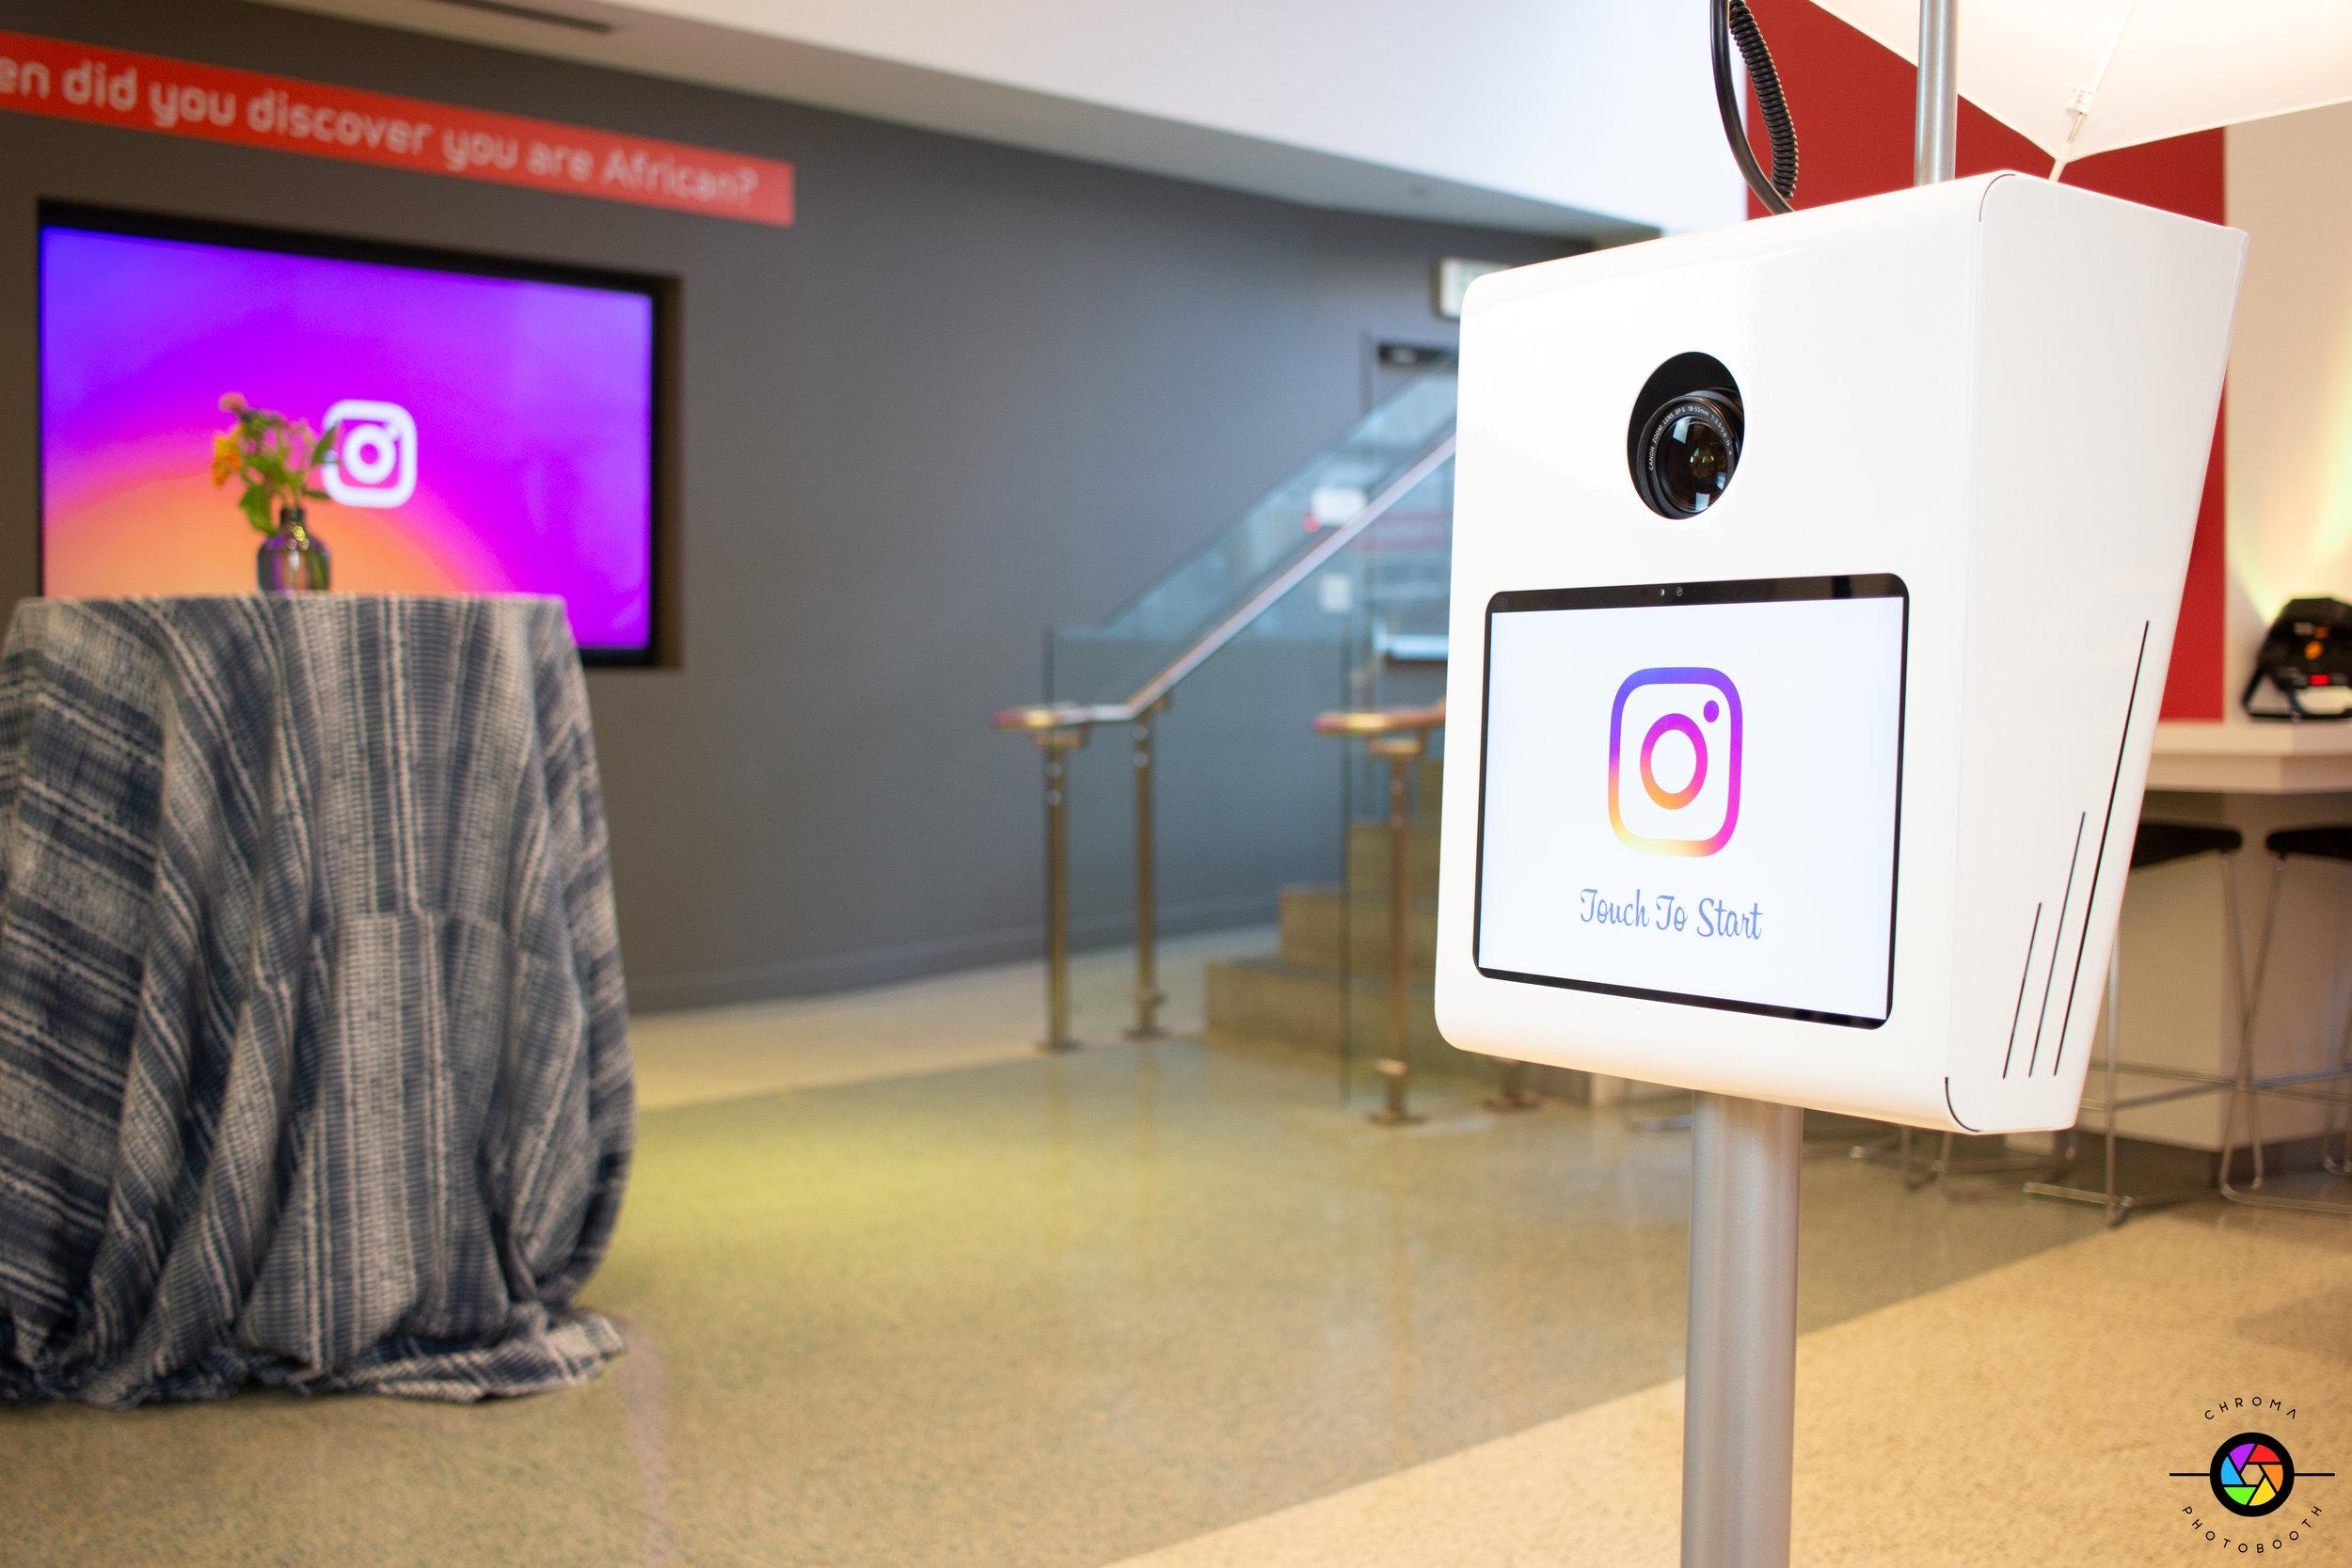 Chroma Photobooth - Instagram Photobooth Activation (1 of 6).jpg